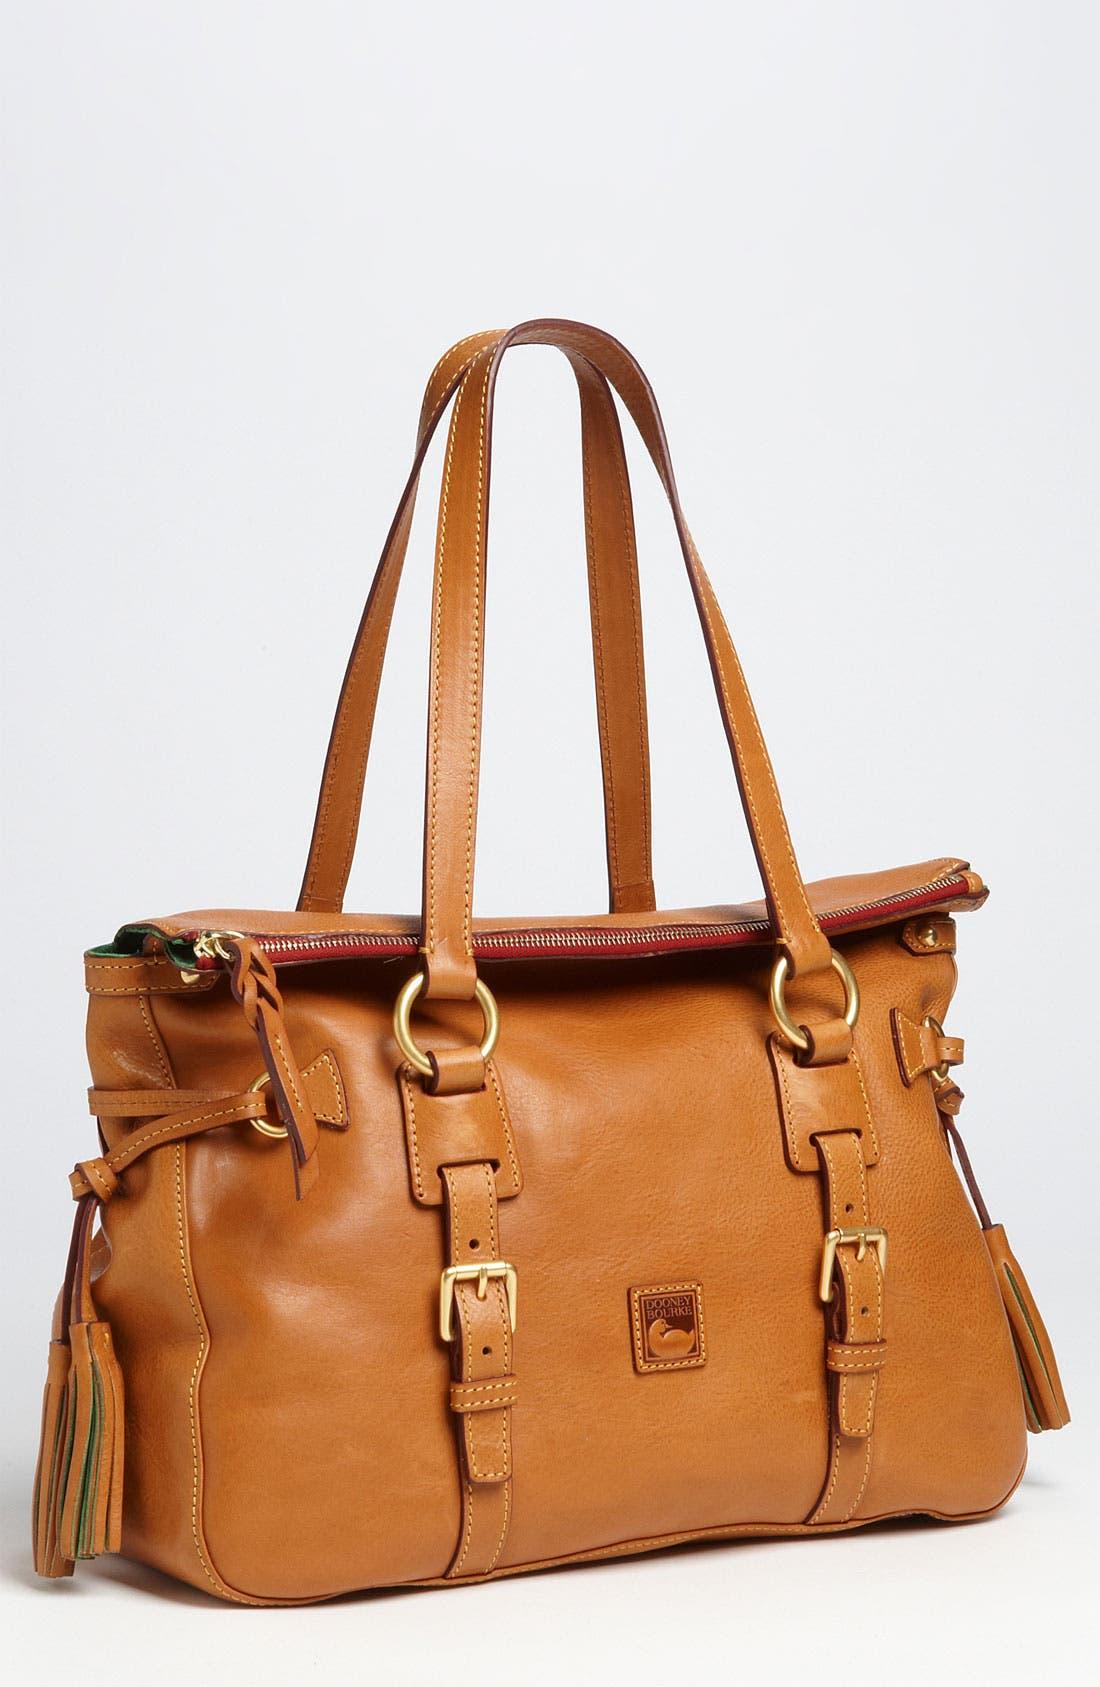 Alternate Image 1 Selected - Dooney & Bourke 'Florentine' Vachetta Leather Satchel